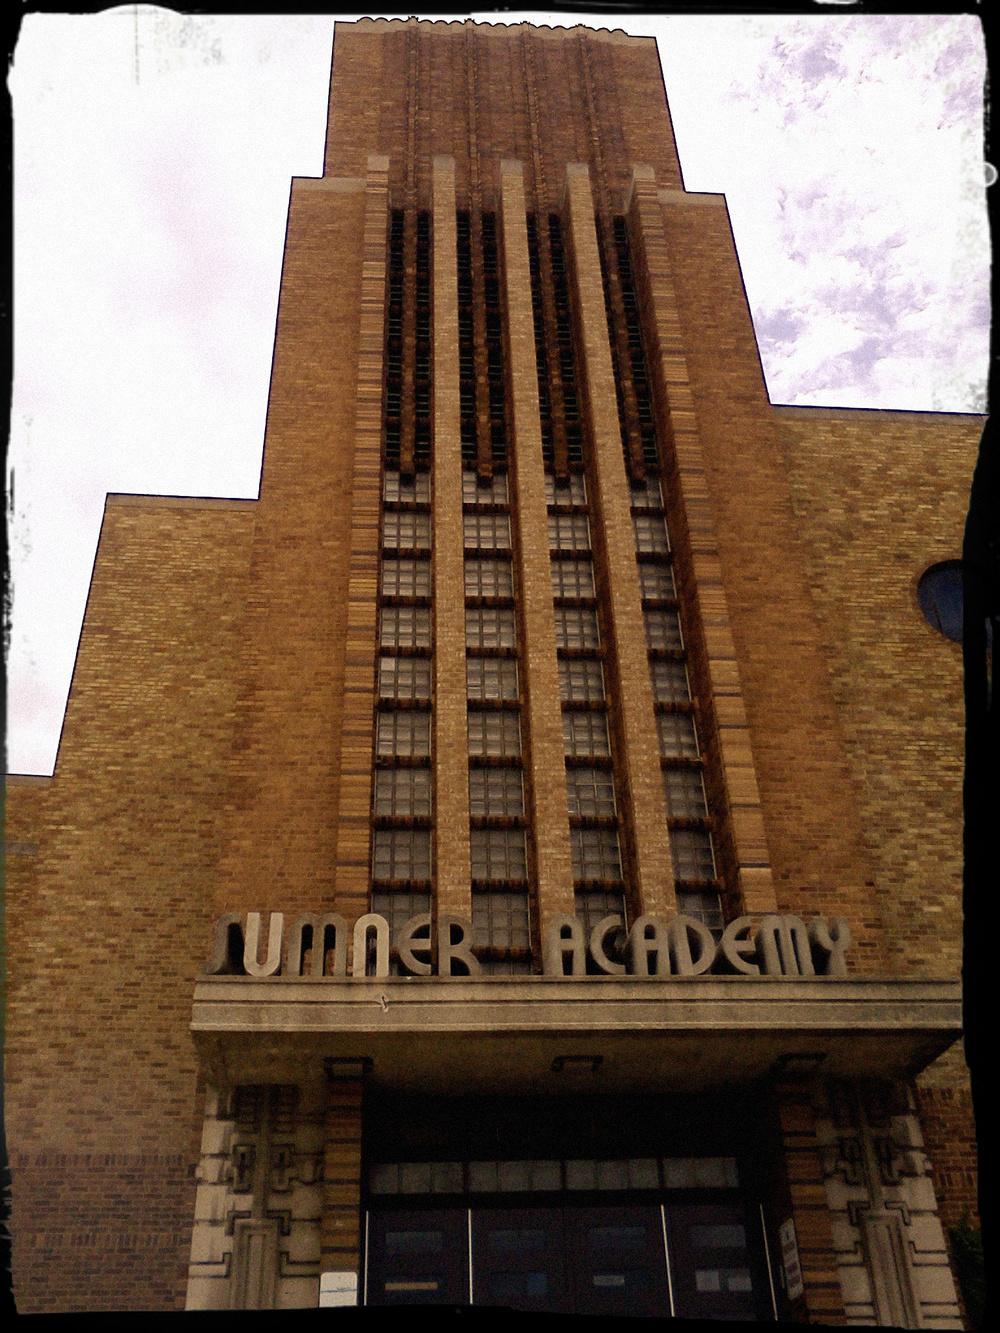 sumner-academy-004.jpg